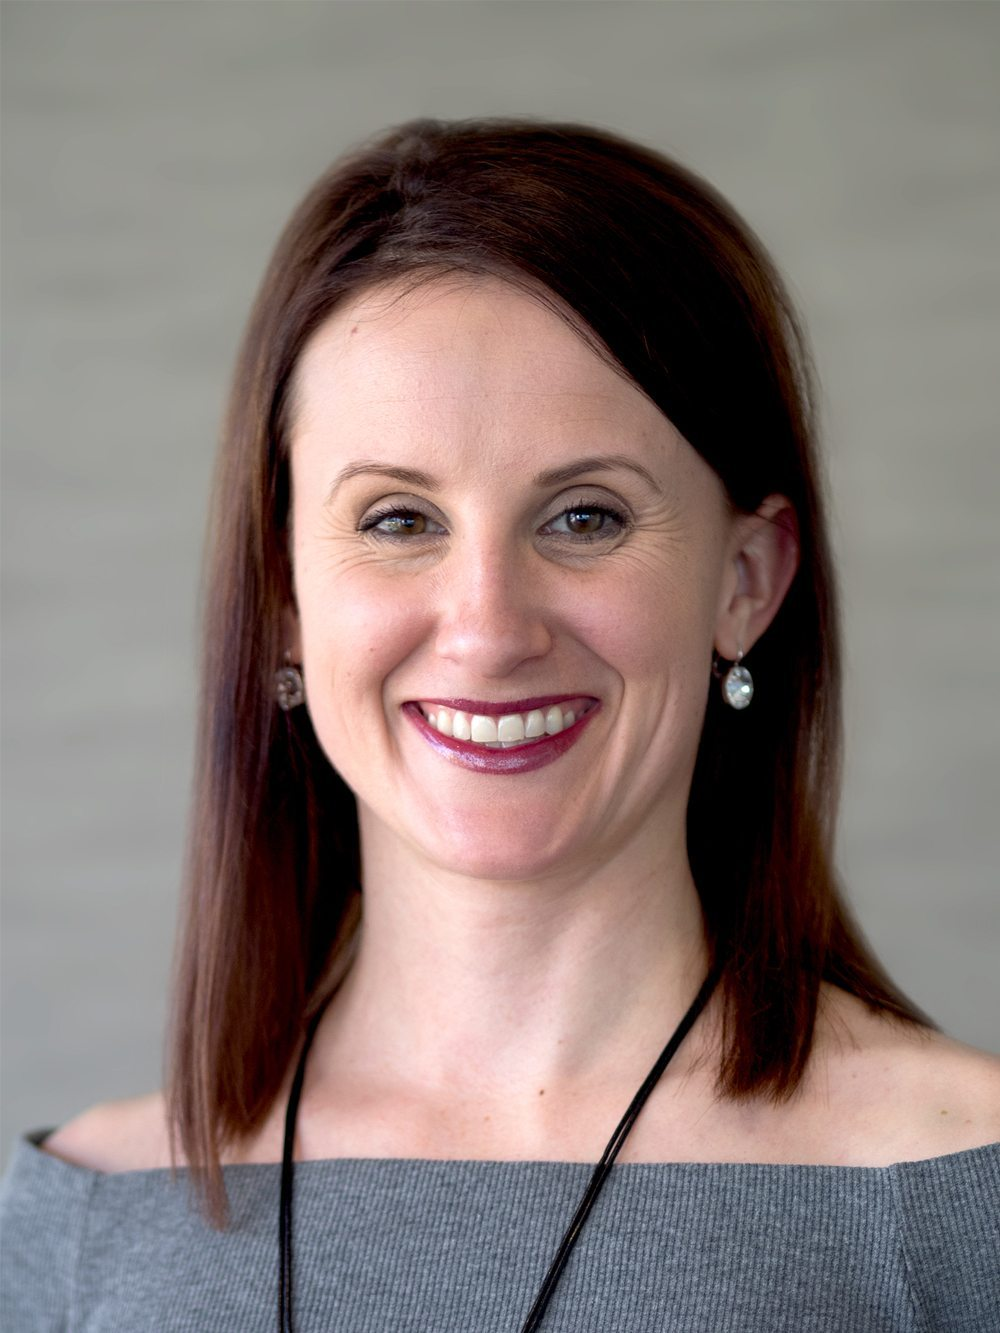 Financial Advisors Perth - Ilana Nienaber - Associate Adviser